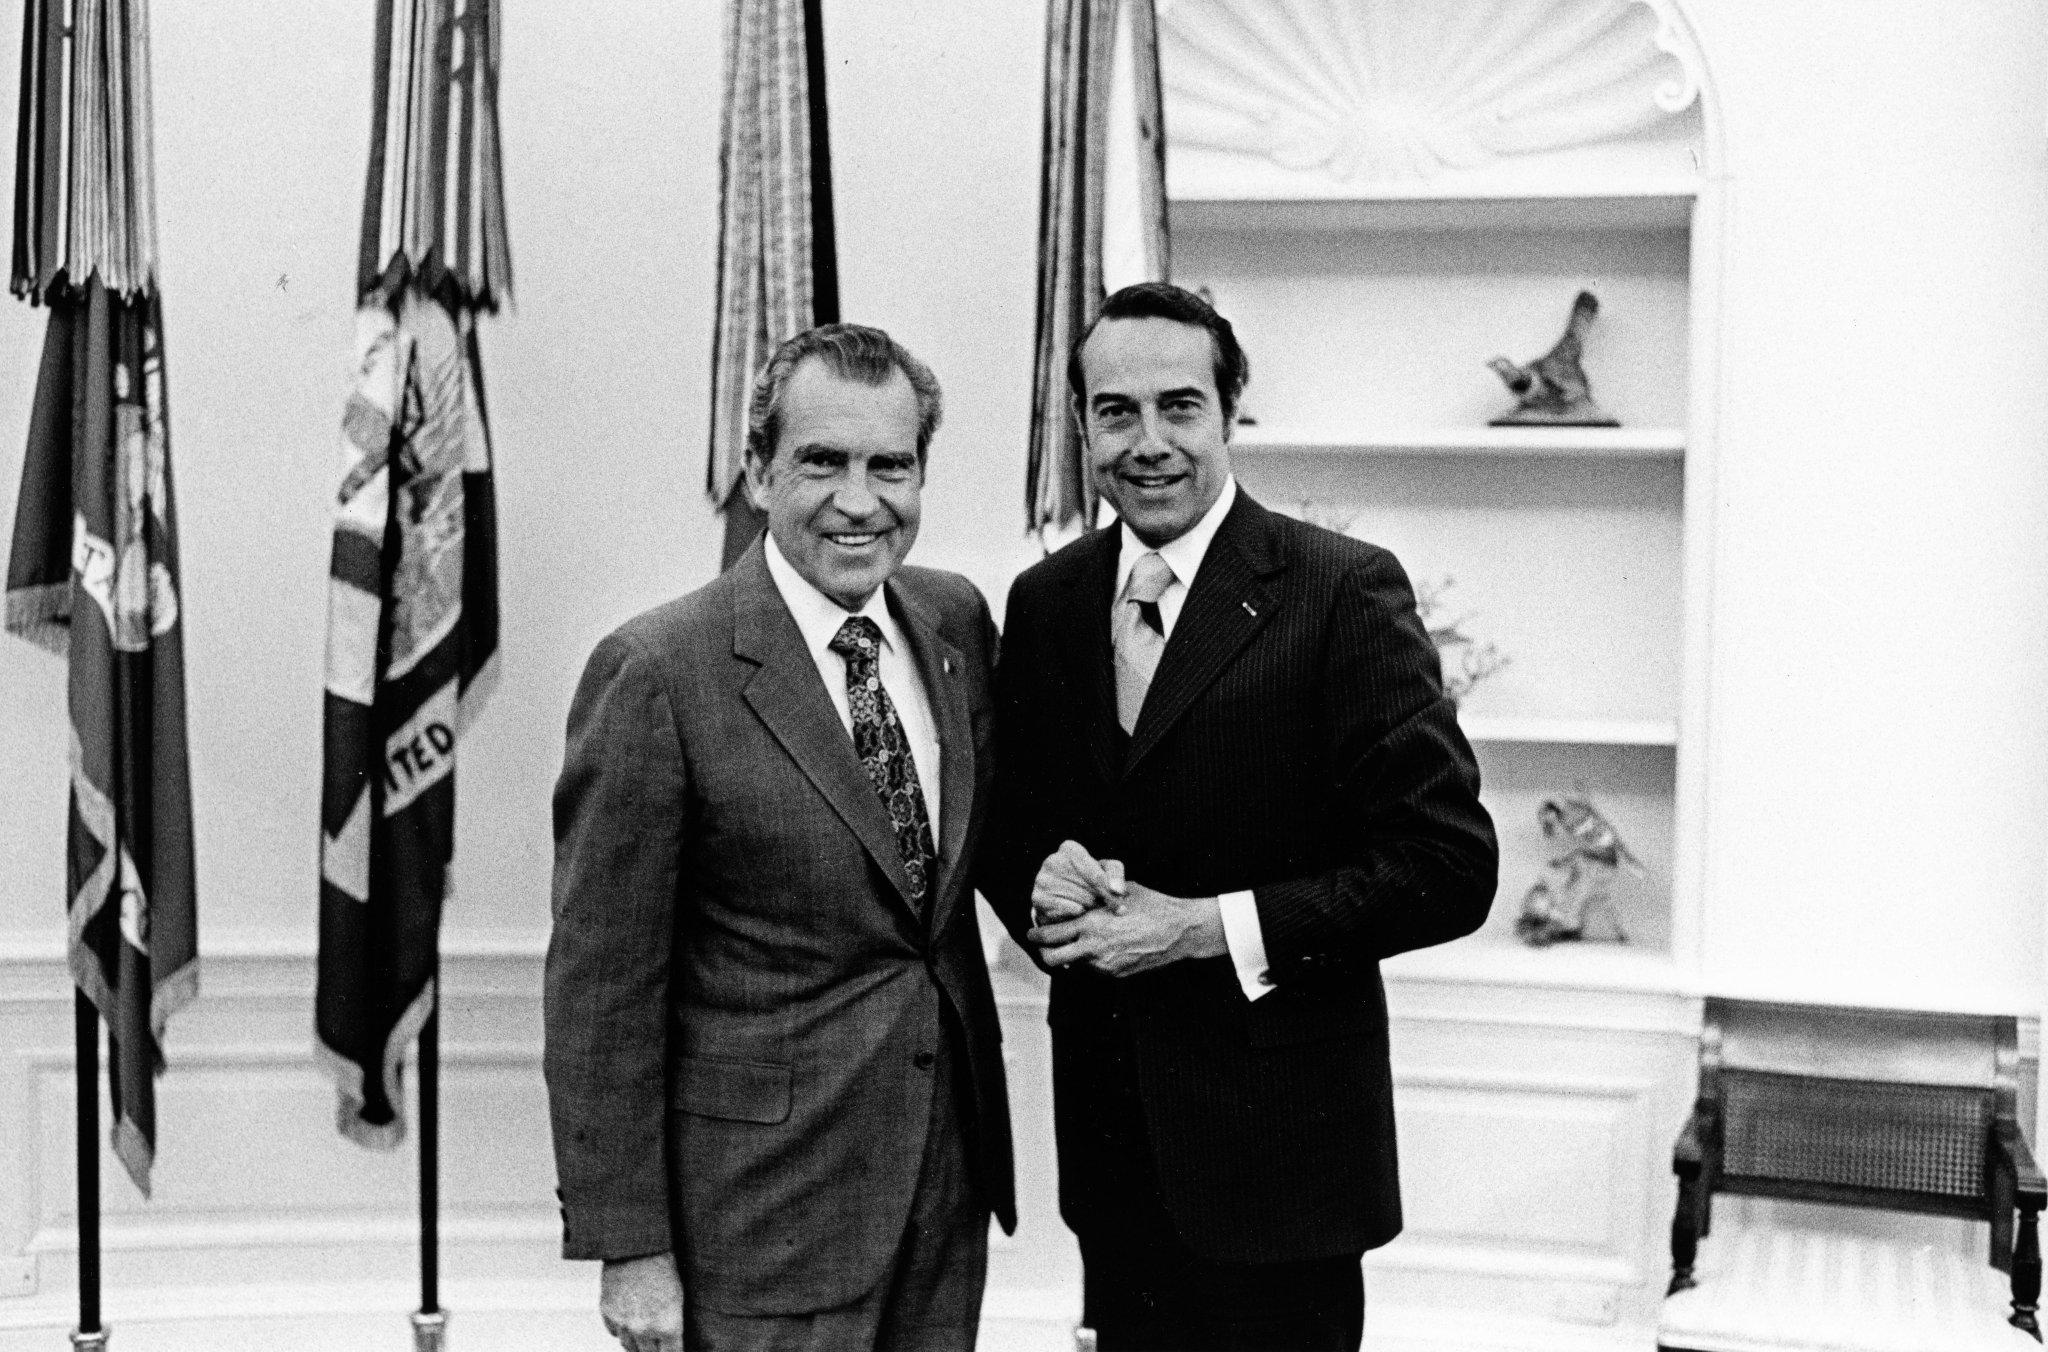 Tricia Nixon Cox and Julie Nixon Eisenhower Congratulate Senator Bob Dole on Receiving the Congressional Gold Medal